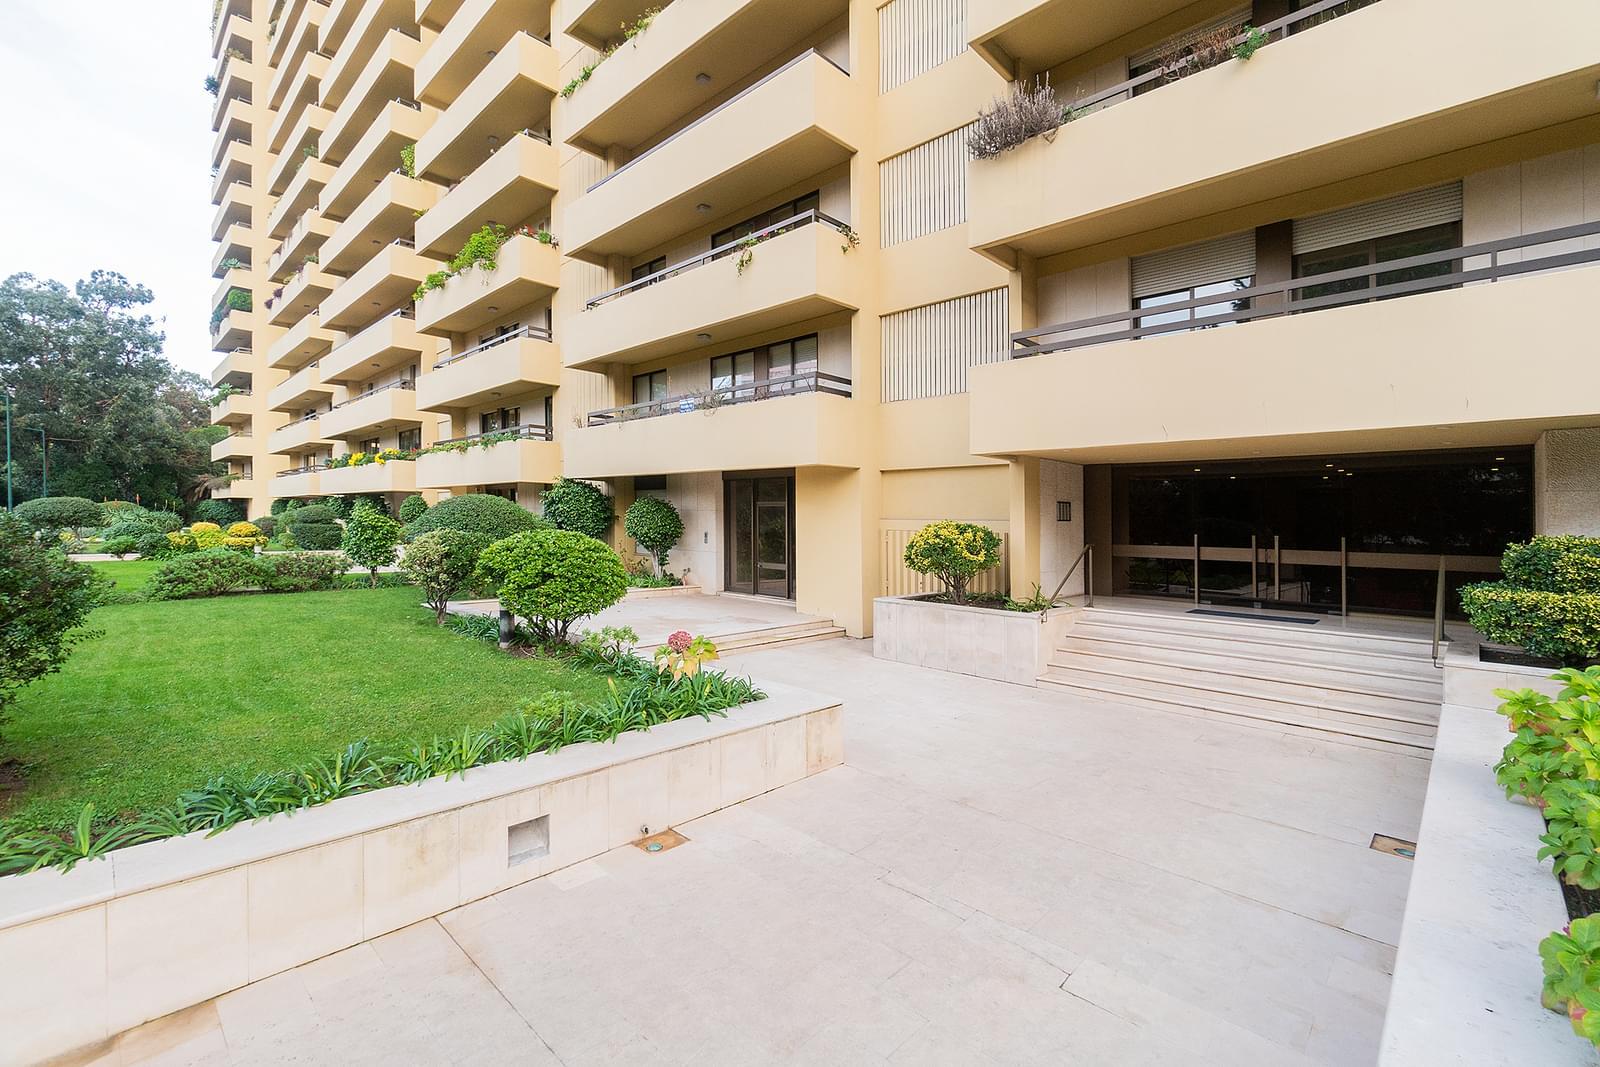 pf18551-apartamento-t3-1-lisboa-14b10fb7-3397-450e-addb-66a24367bf98